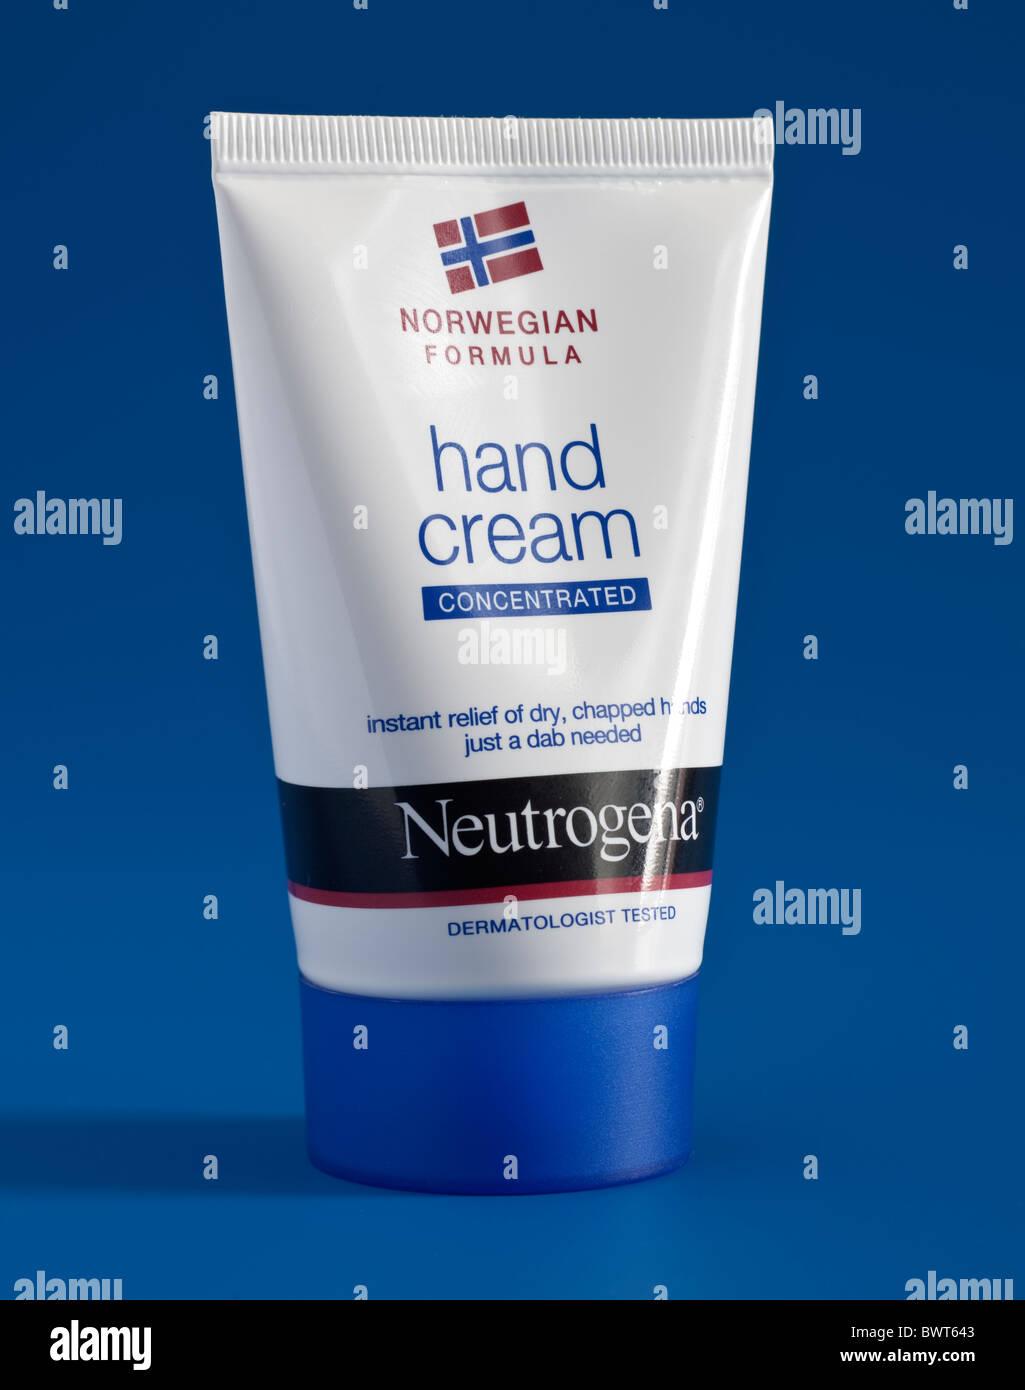 Tube of Neutrogena hand cream - Stock Image